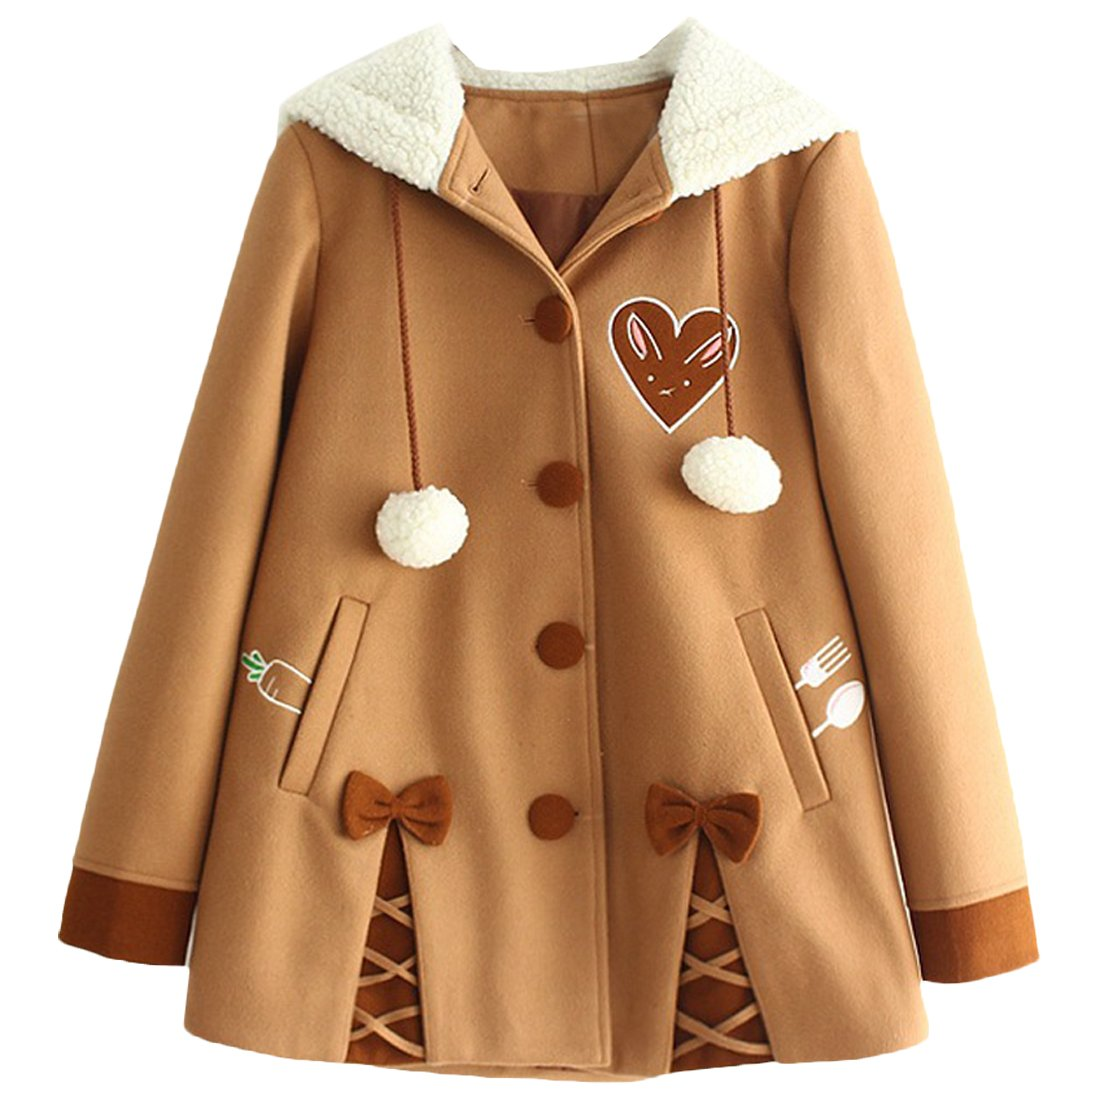 Partiss Womens Winter Cute Button Fleece Pea Coat Hooded Outwear Jacket,S,Brown